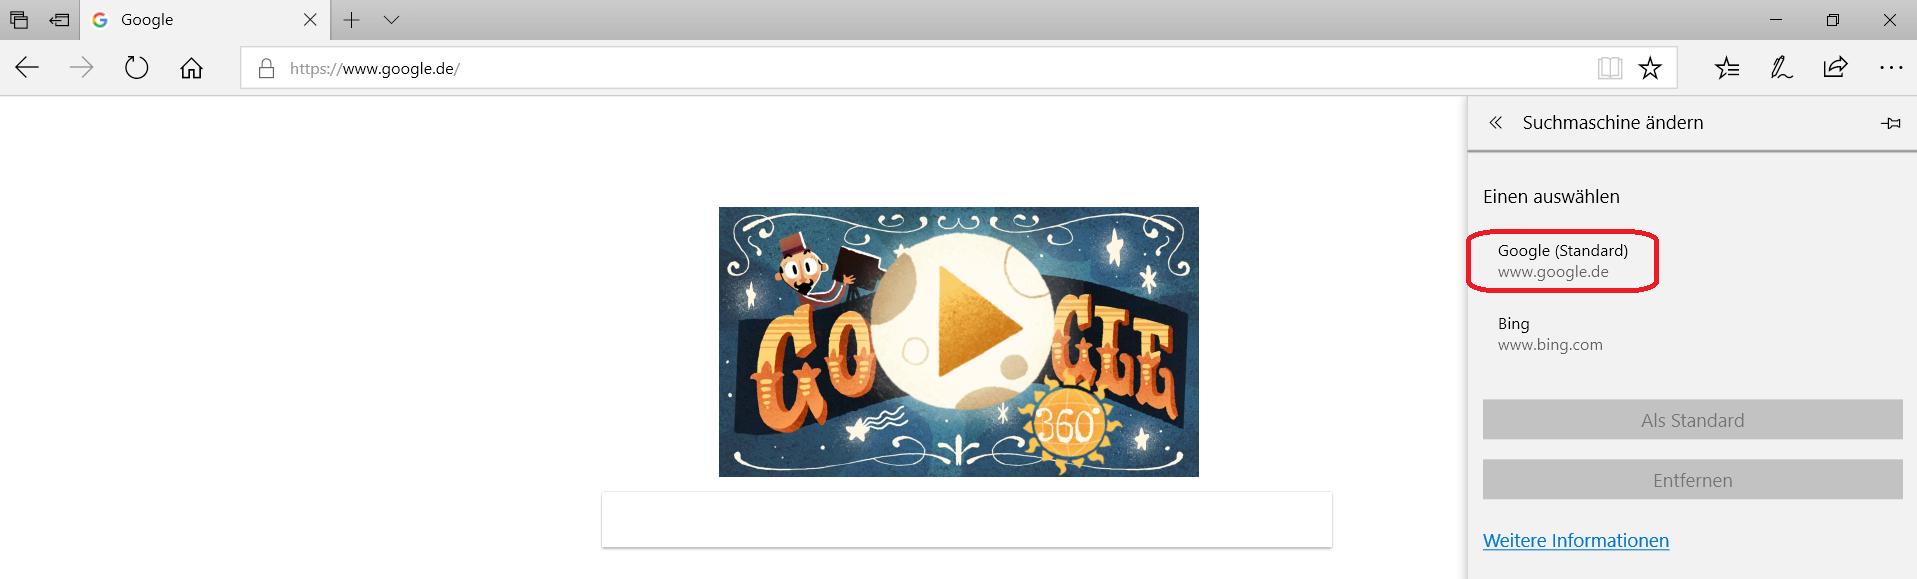 google-als-standard